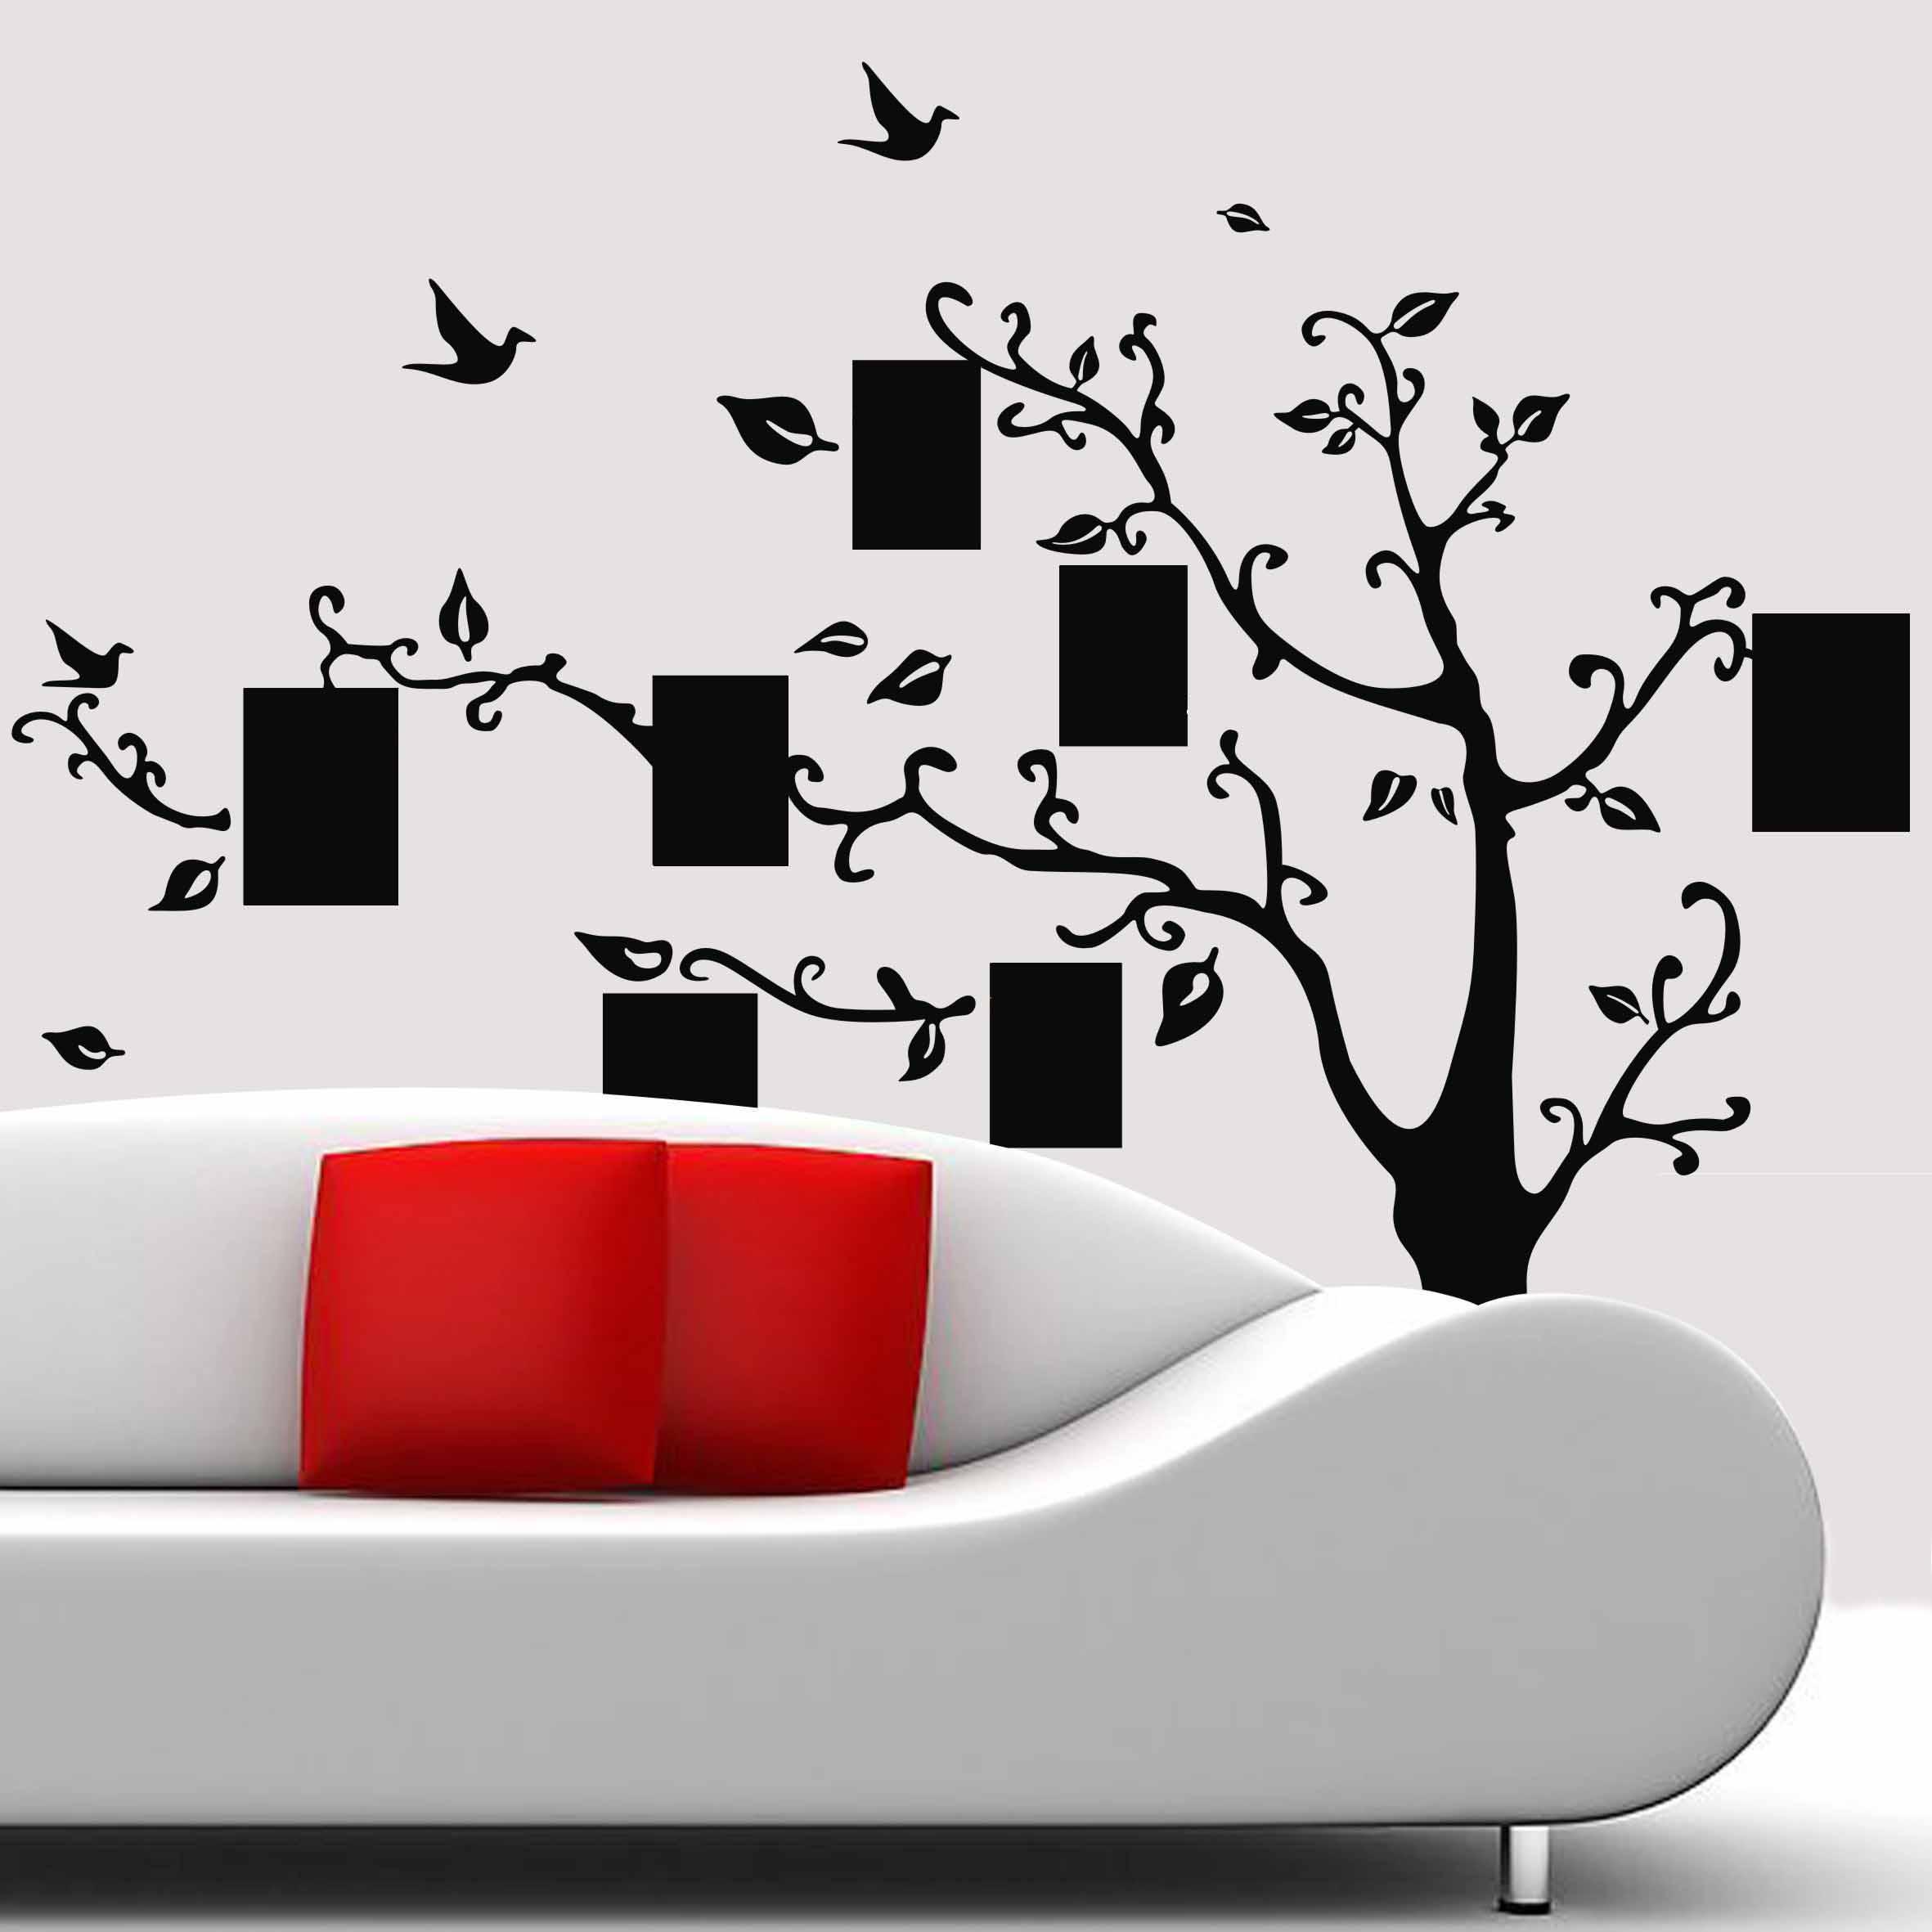 wandtattoo bilderrahmen baum innenraumdesign wandsticker ebay. Black Bedroom Furniture Sets. Home Design Ideas